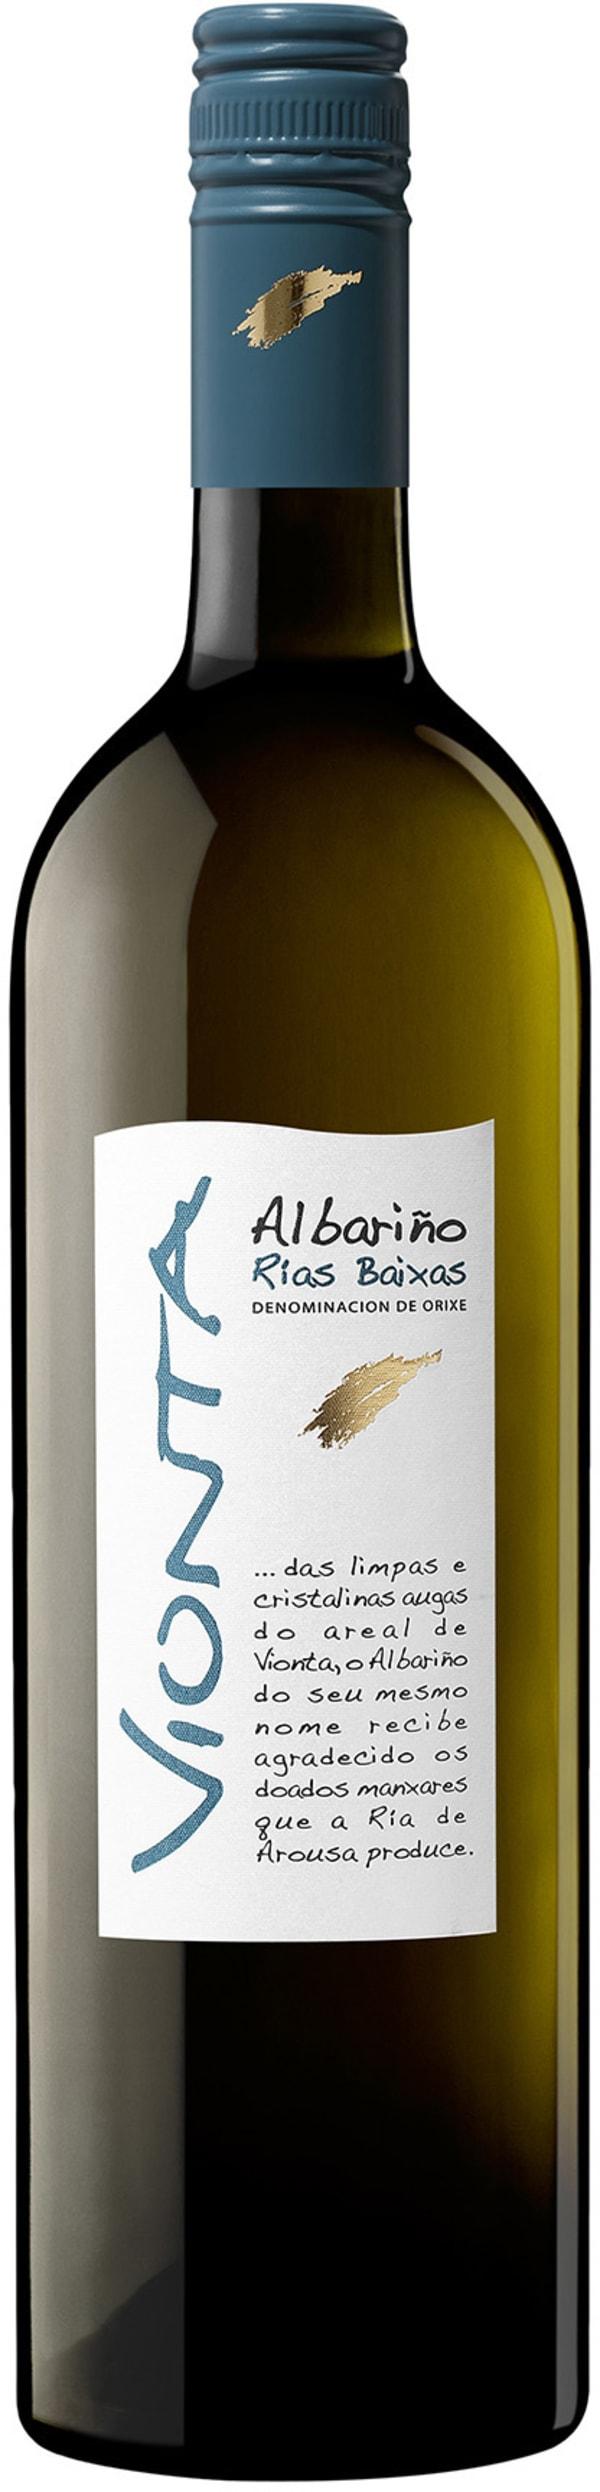 Vionta Albariño 2015